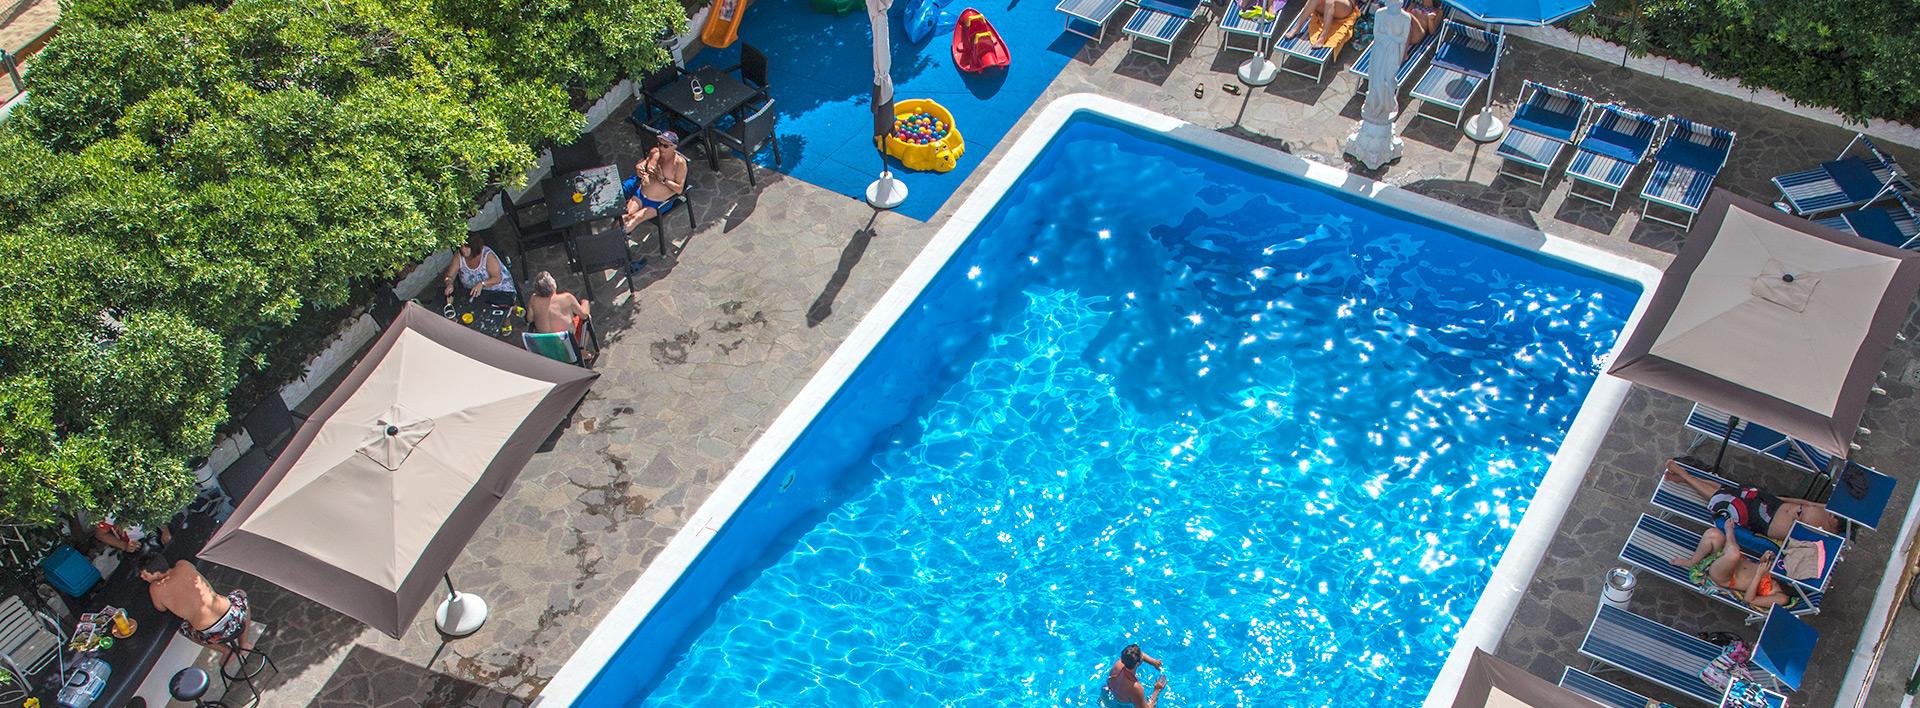 Hotel con Piscina Baia Marina Cattolica